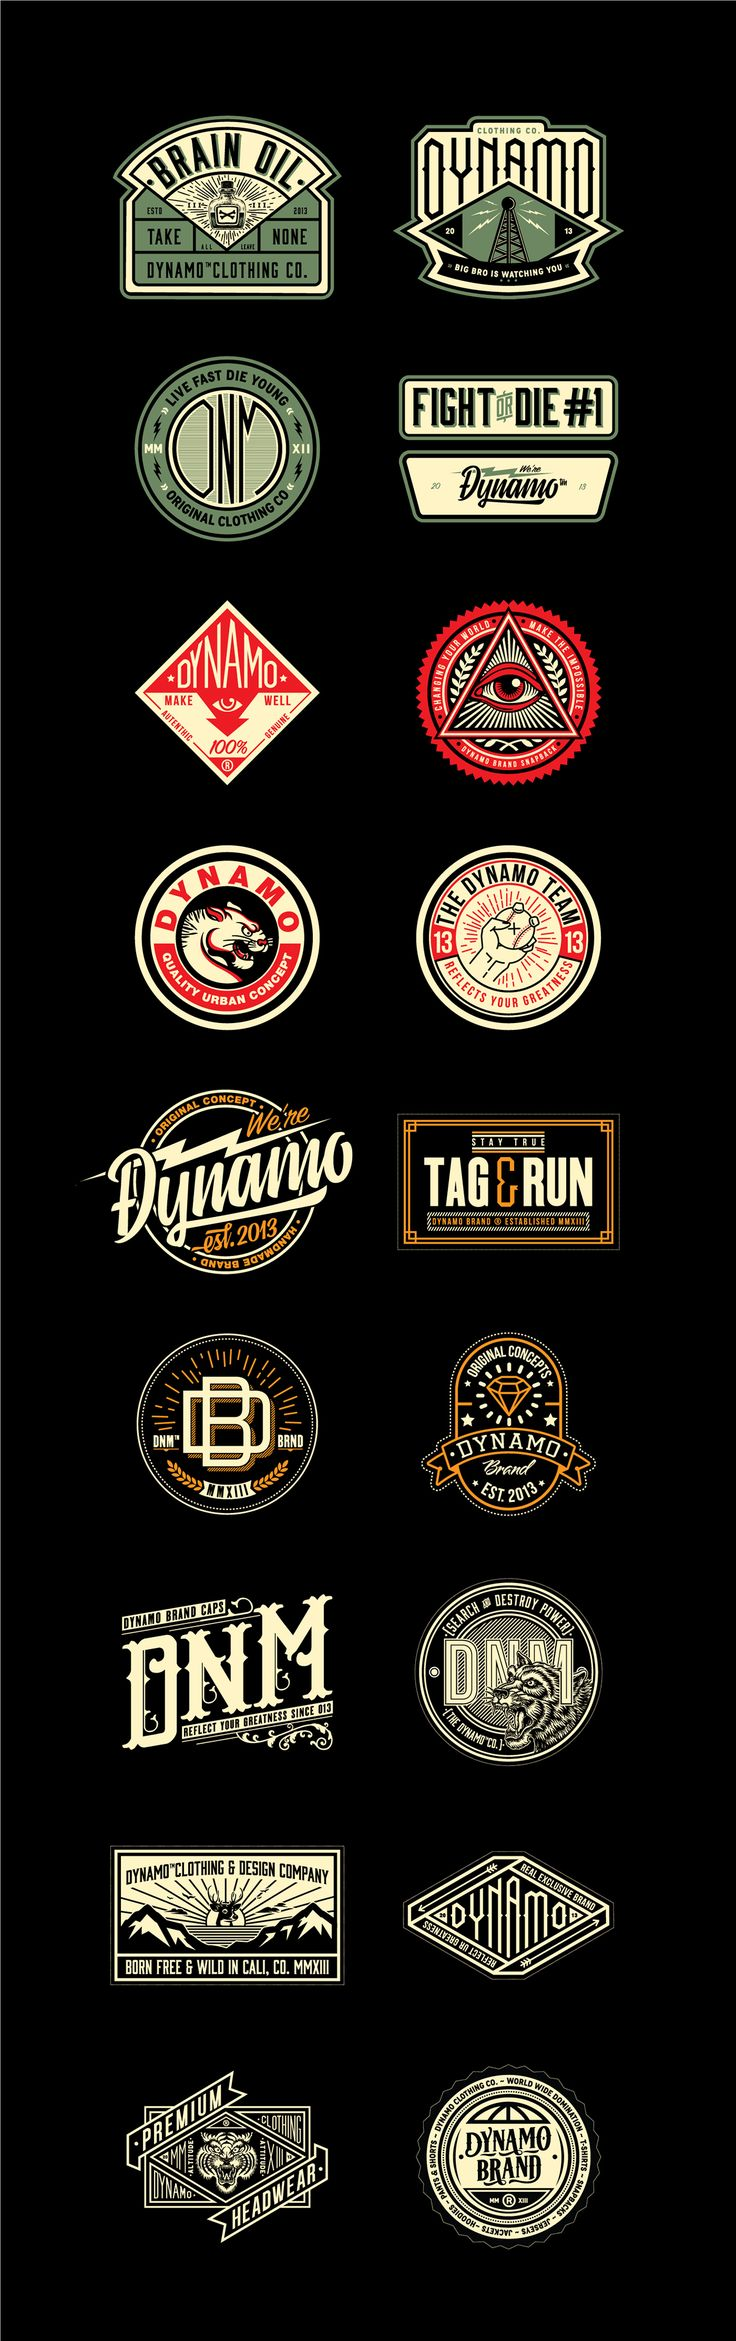 Badges #01 Dynamo™ 015-016 on Behance